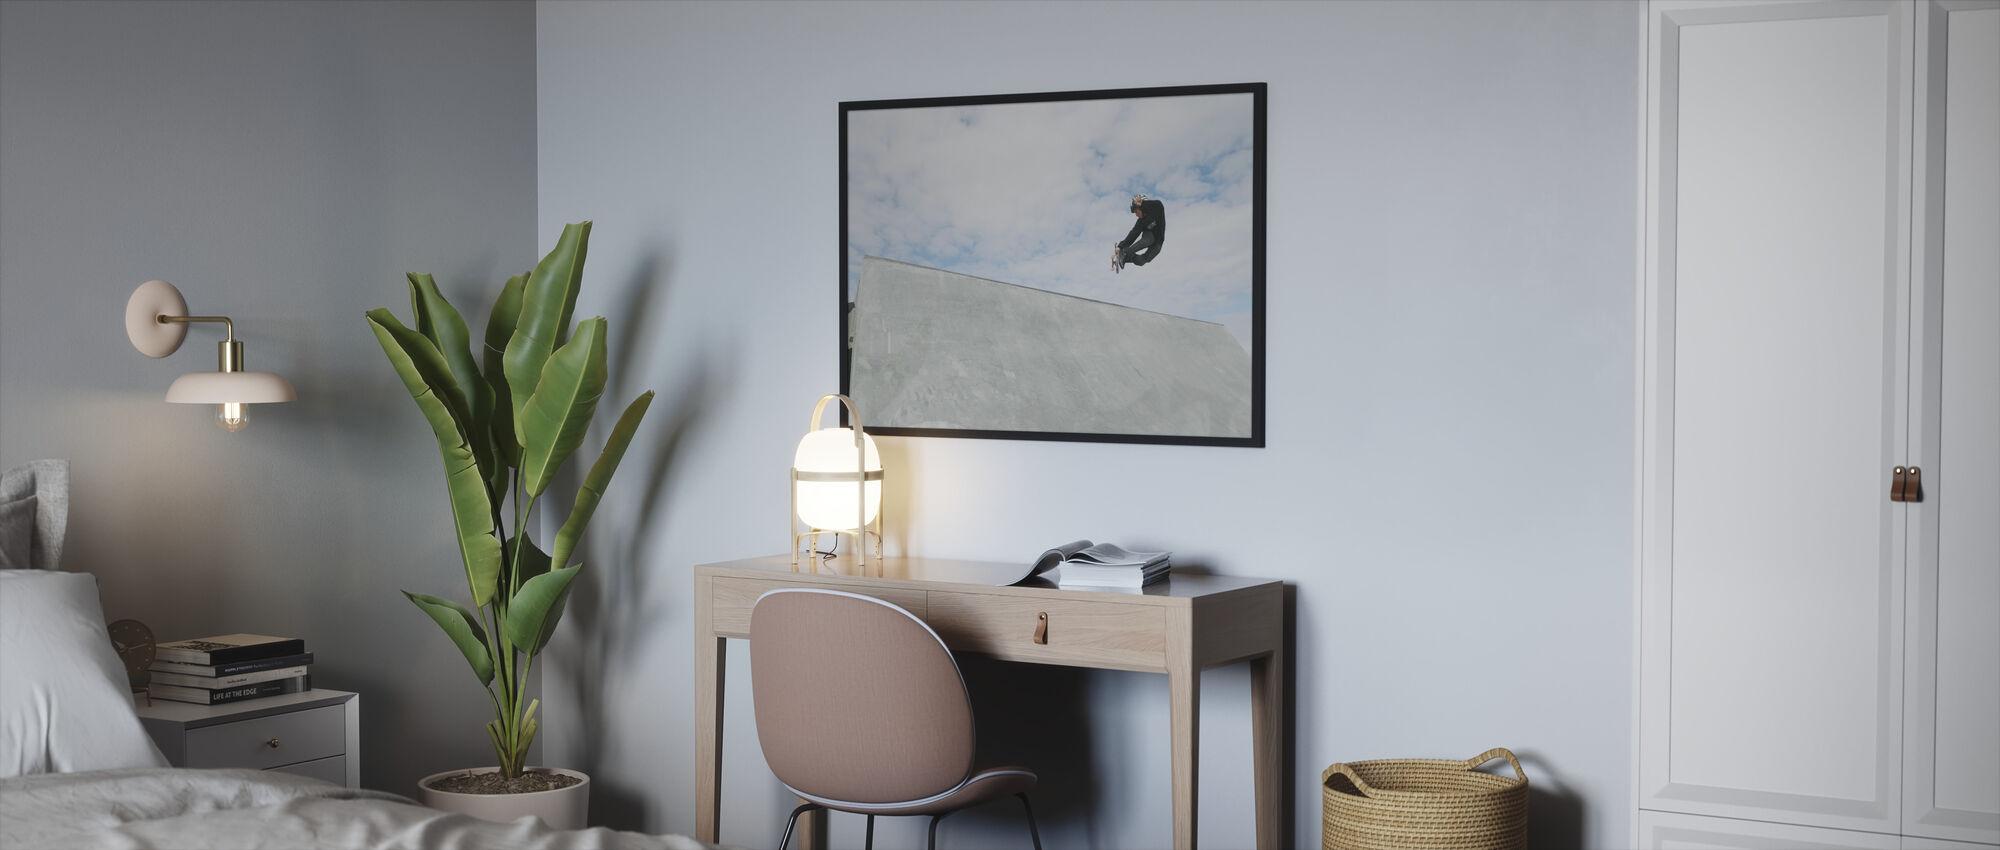 Outdoor-Skateboarding - Gerahmtes bild - Schlafzimmer